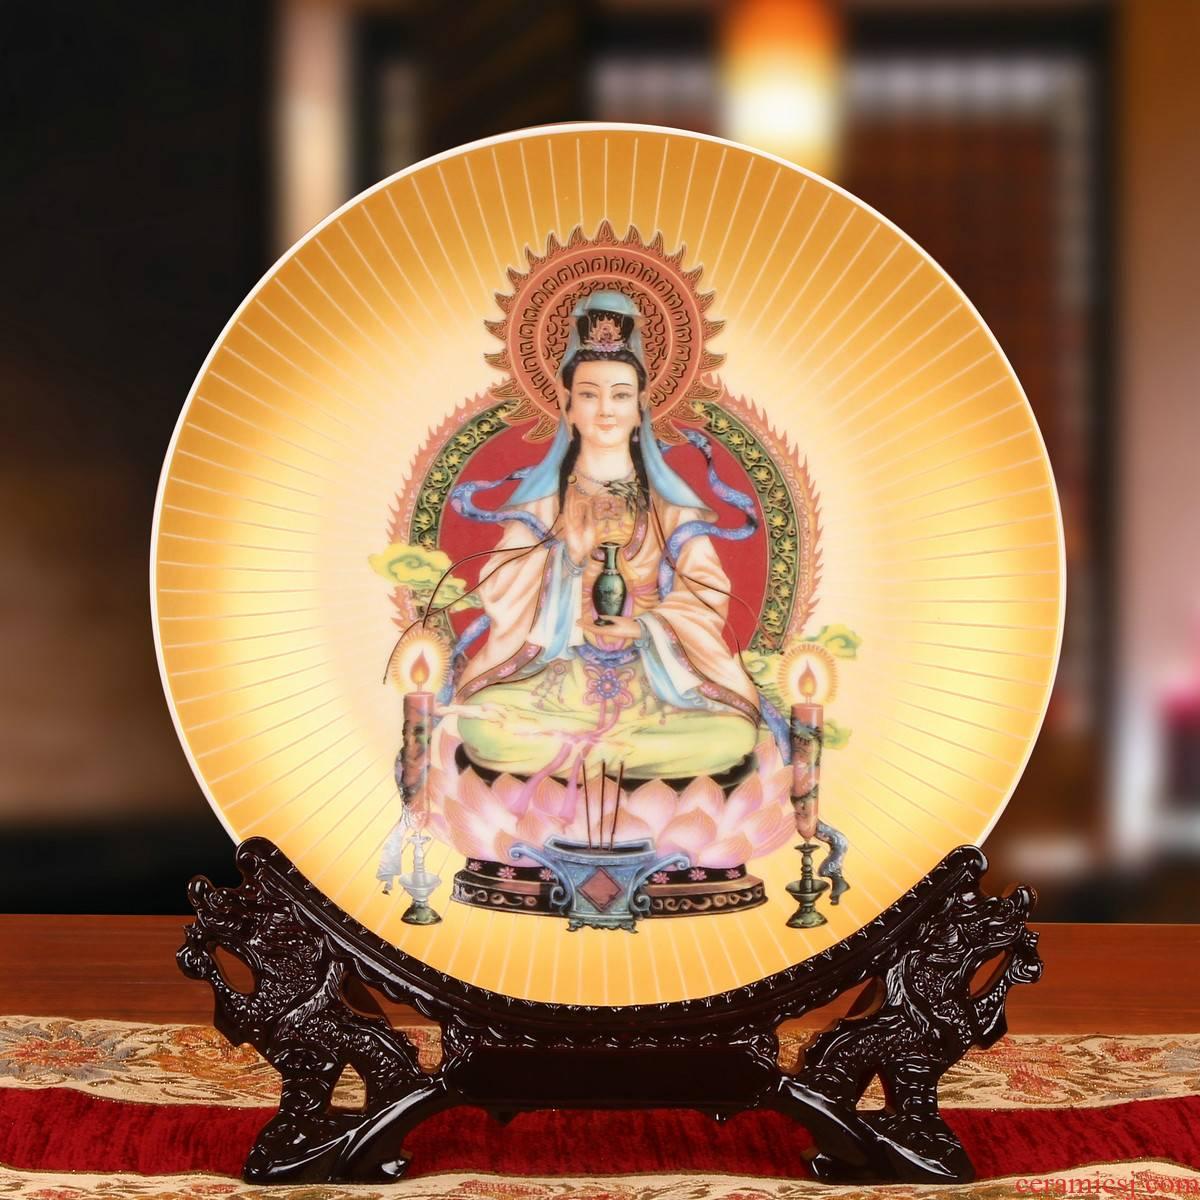 End of jingdezhen ceramics gold guanyin tuas hang dish his classical Chinese buddhist gift furnishing articles